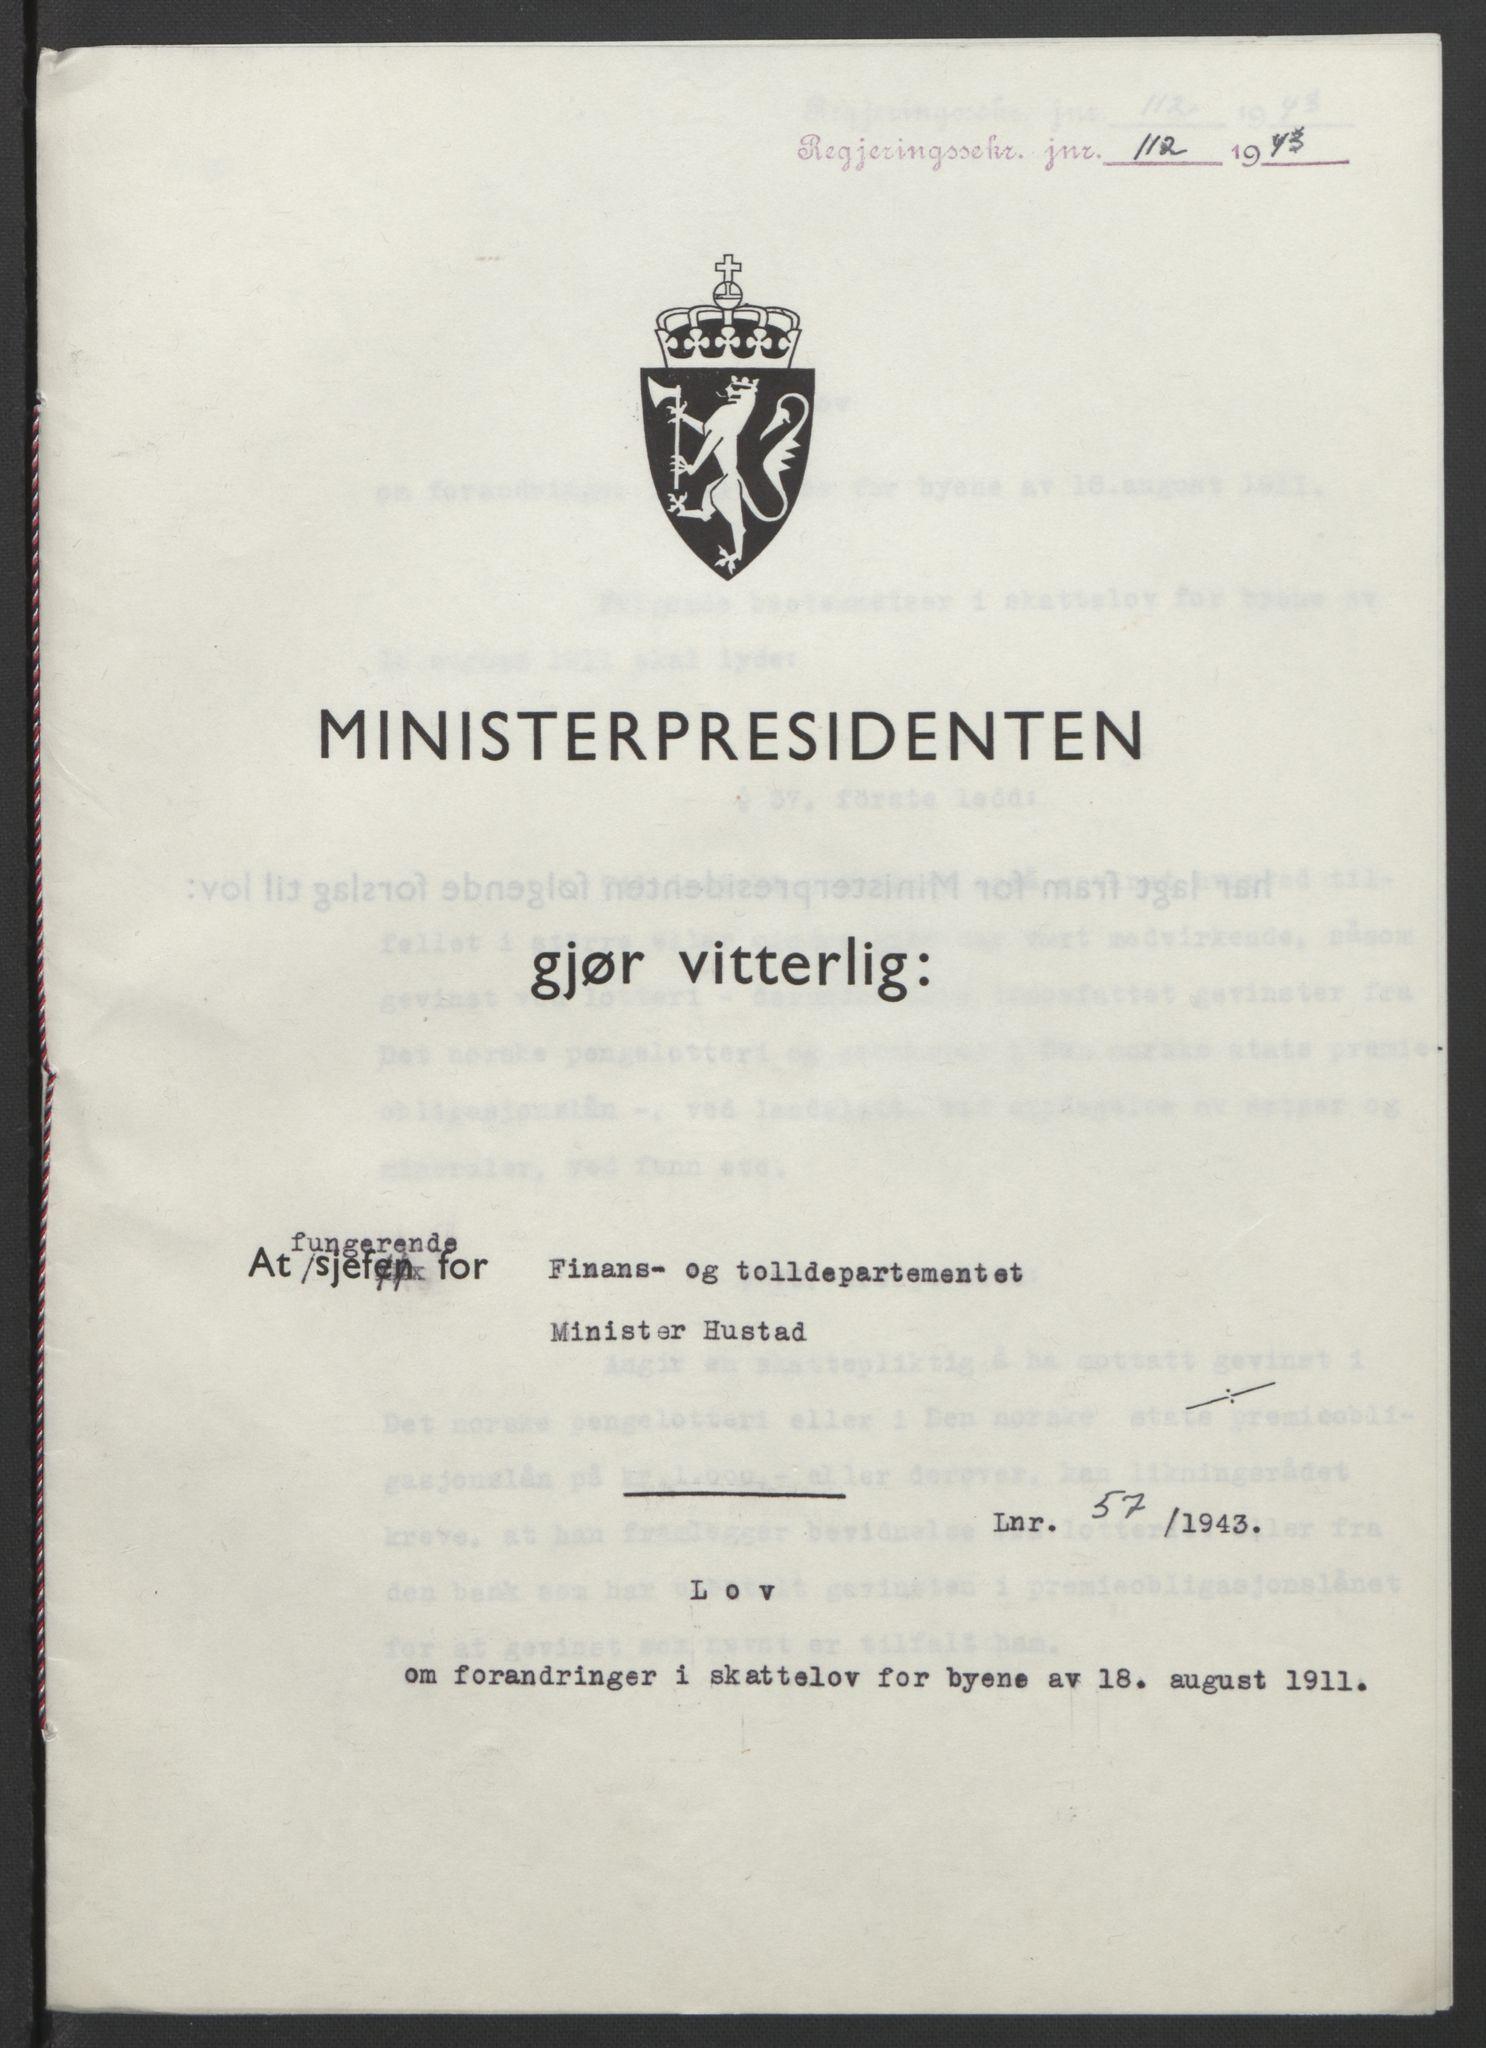 RA, NS-administrasjonen 1940-1945 (Statsrådsekretariatet, de kommisariske statsråder mm), D/Db/L0099: Lover, 1943, s. 255